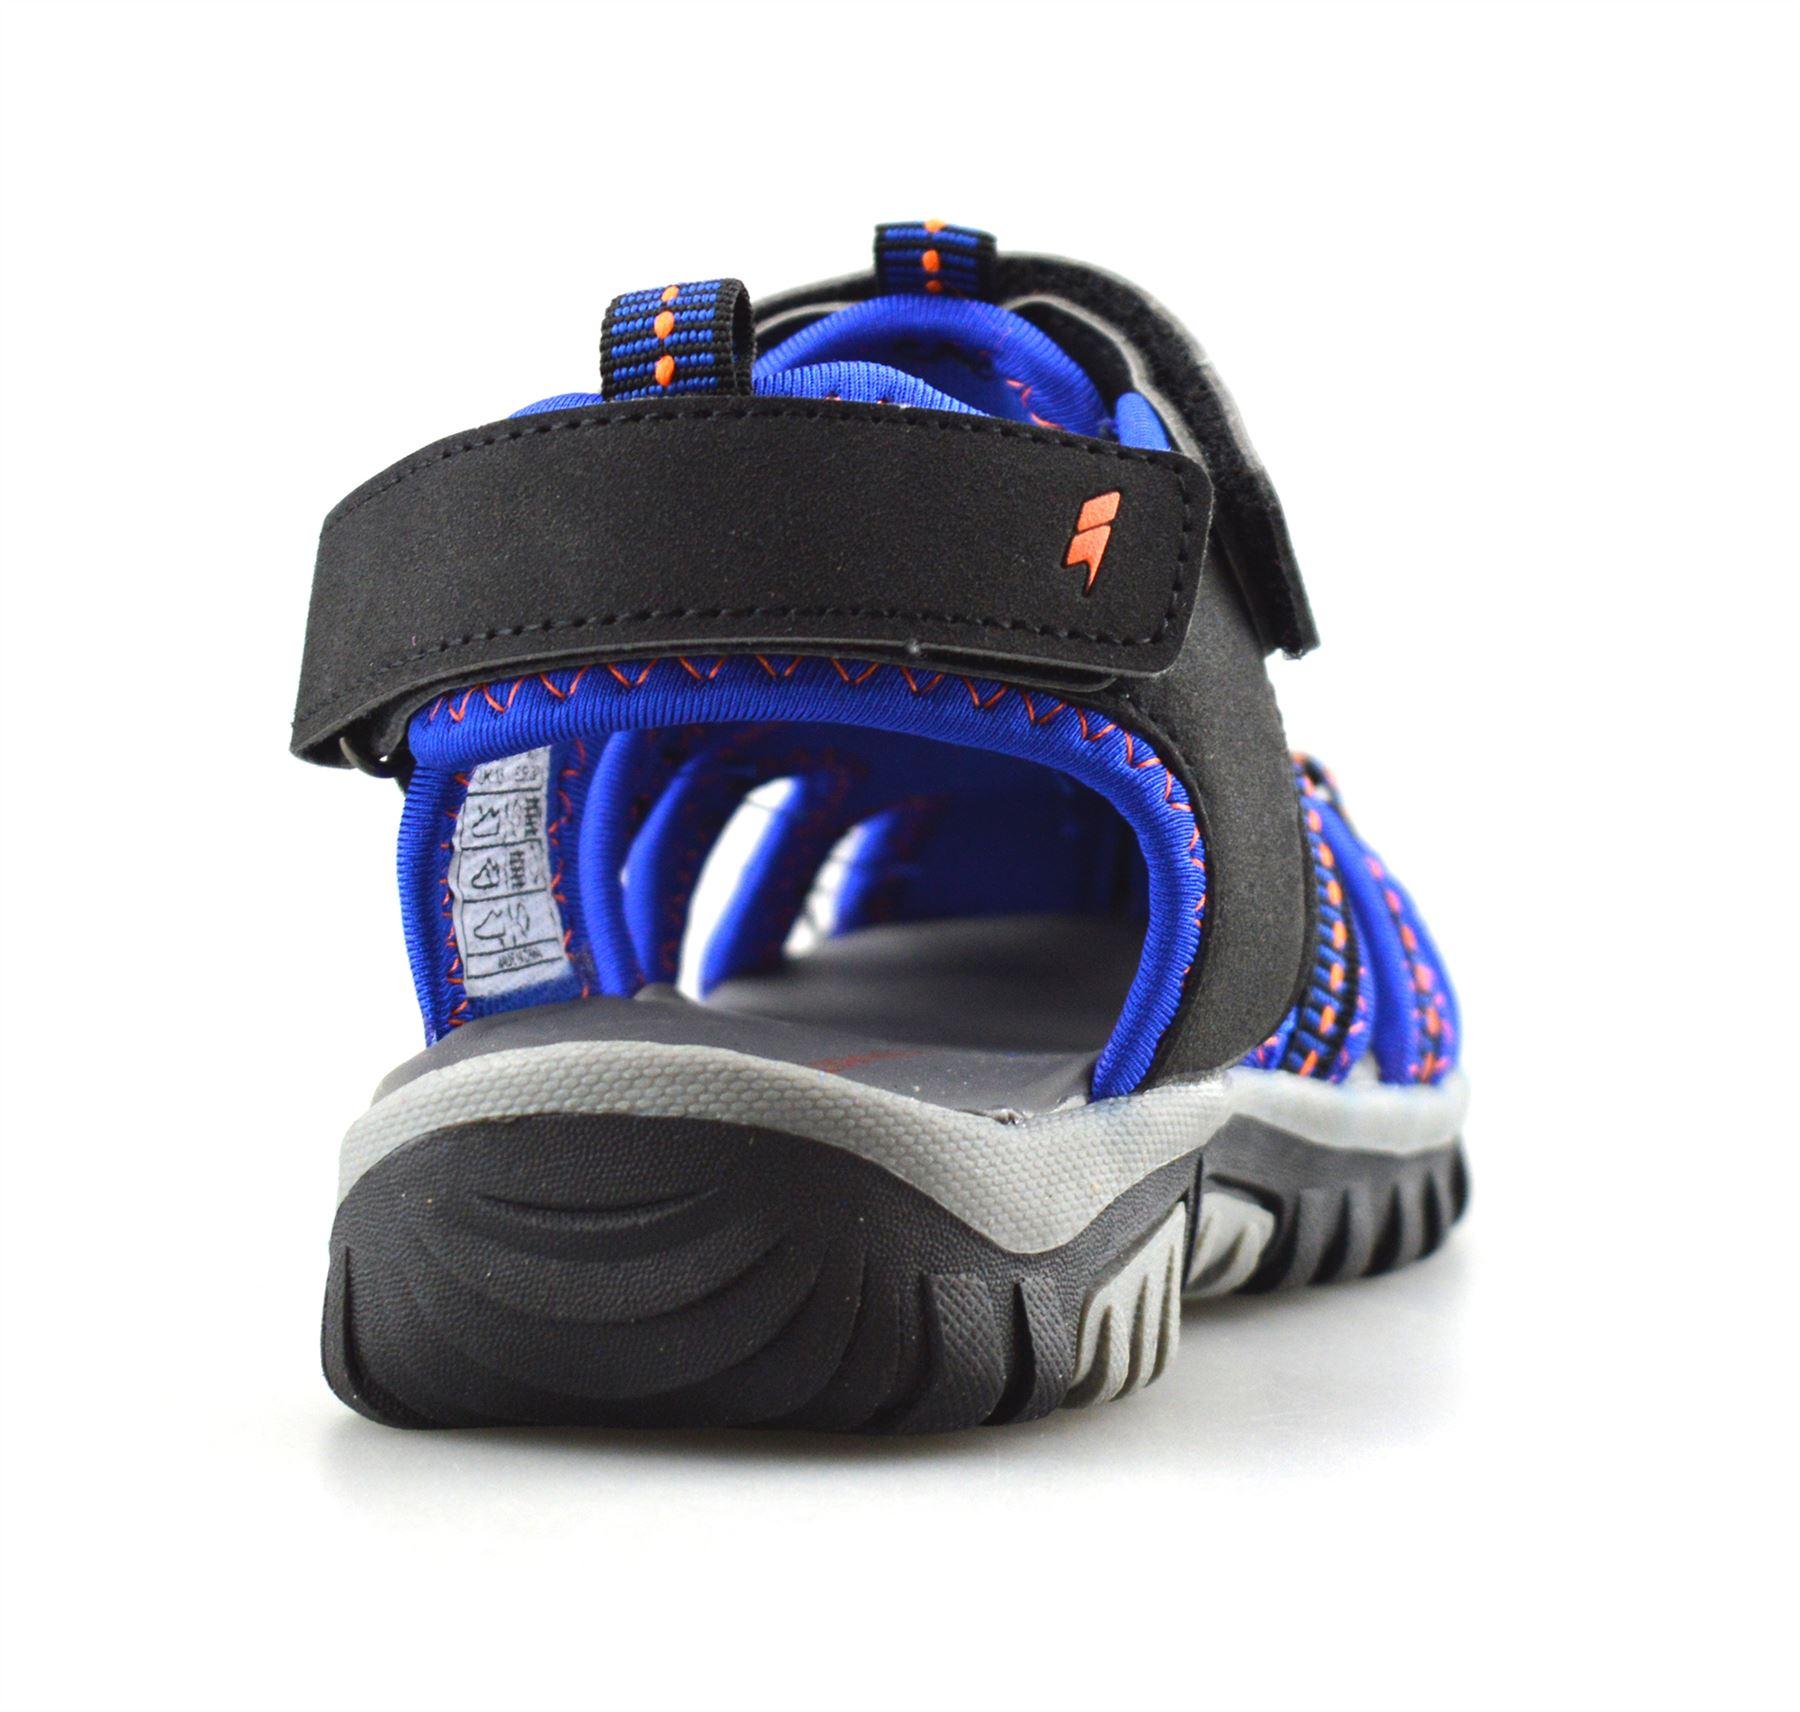 Boys-Girls-Kids-Trespass-Summer-Beach-Casual-Walking-Sports-Sandals-Shoes-Size thumbnail 12